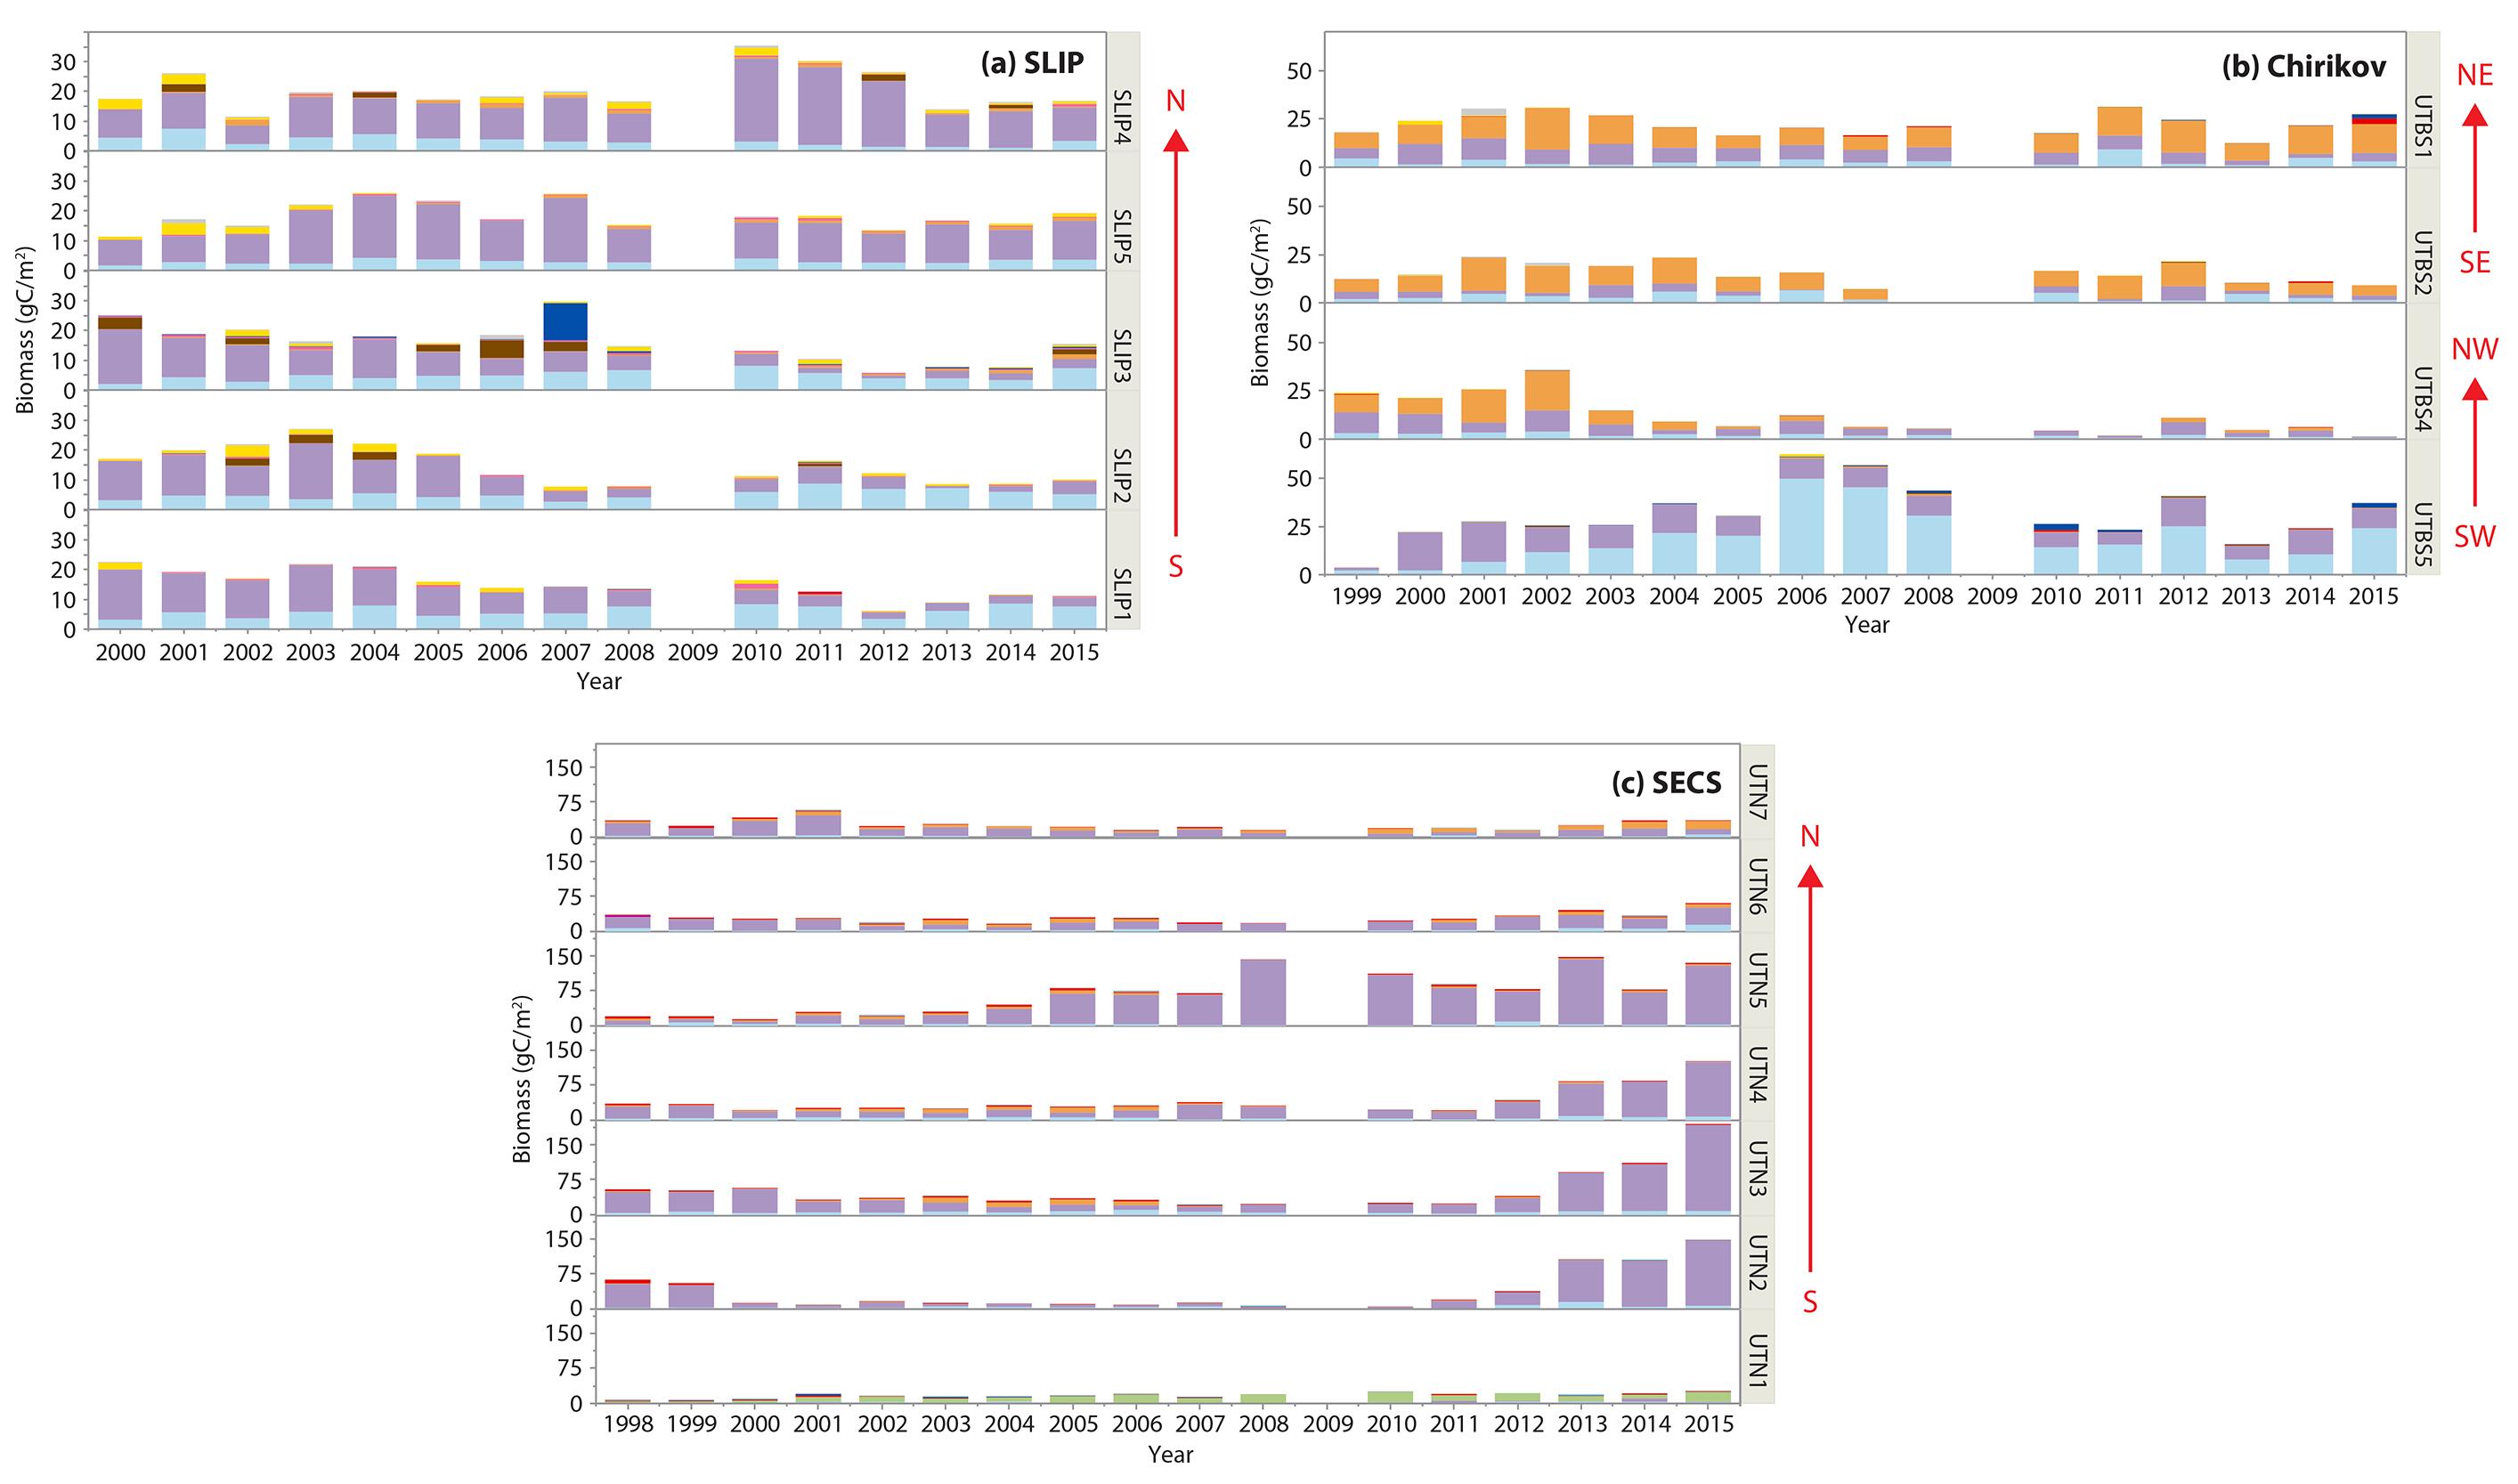 Trends in Benthic Macrofaunal Populations, Seasonal Sea Ice